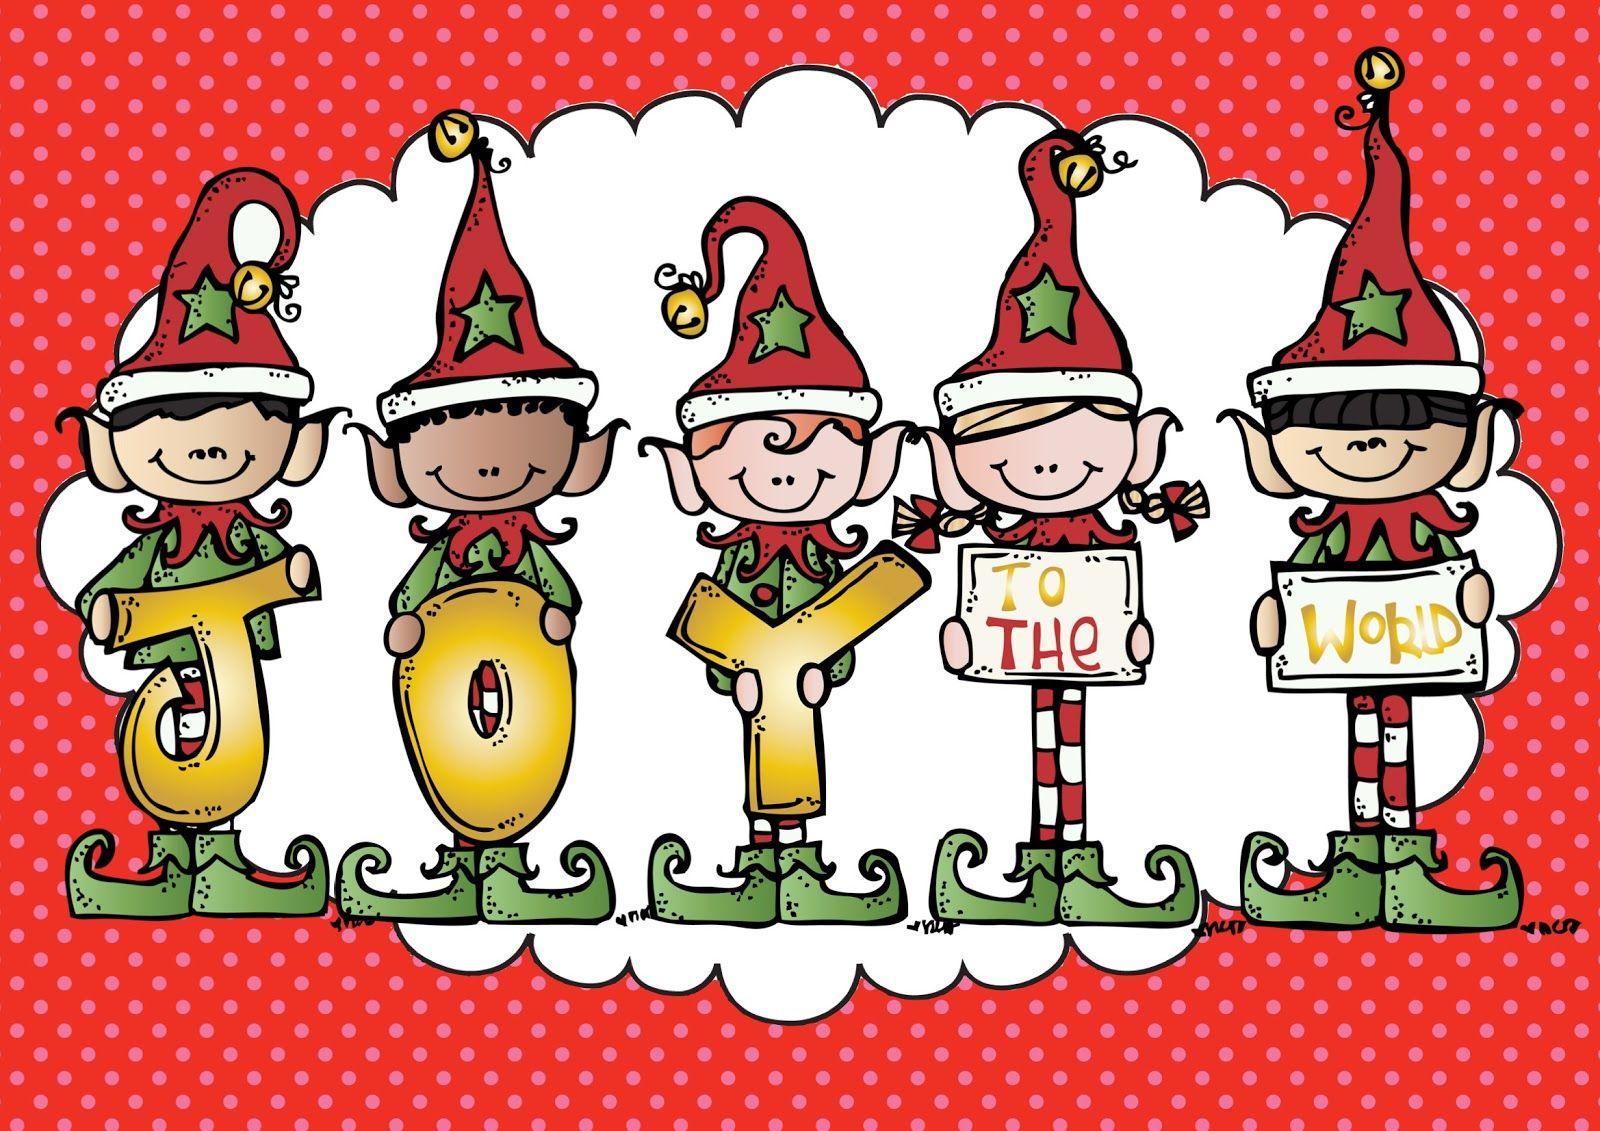 Classroom Fun The Elf On The Shelf The Elf Christmas Party Invitations Elf Classroom